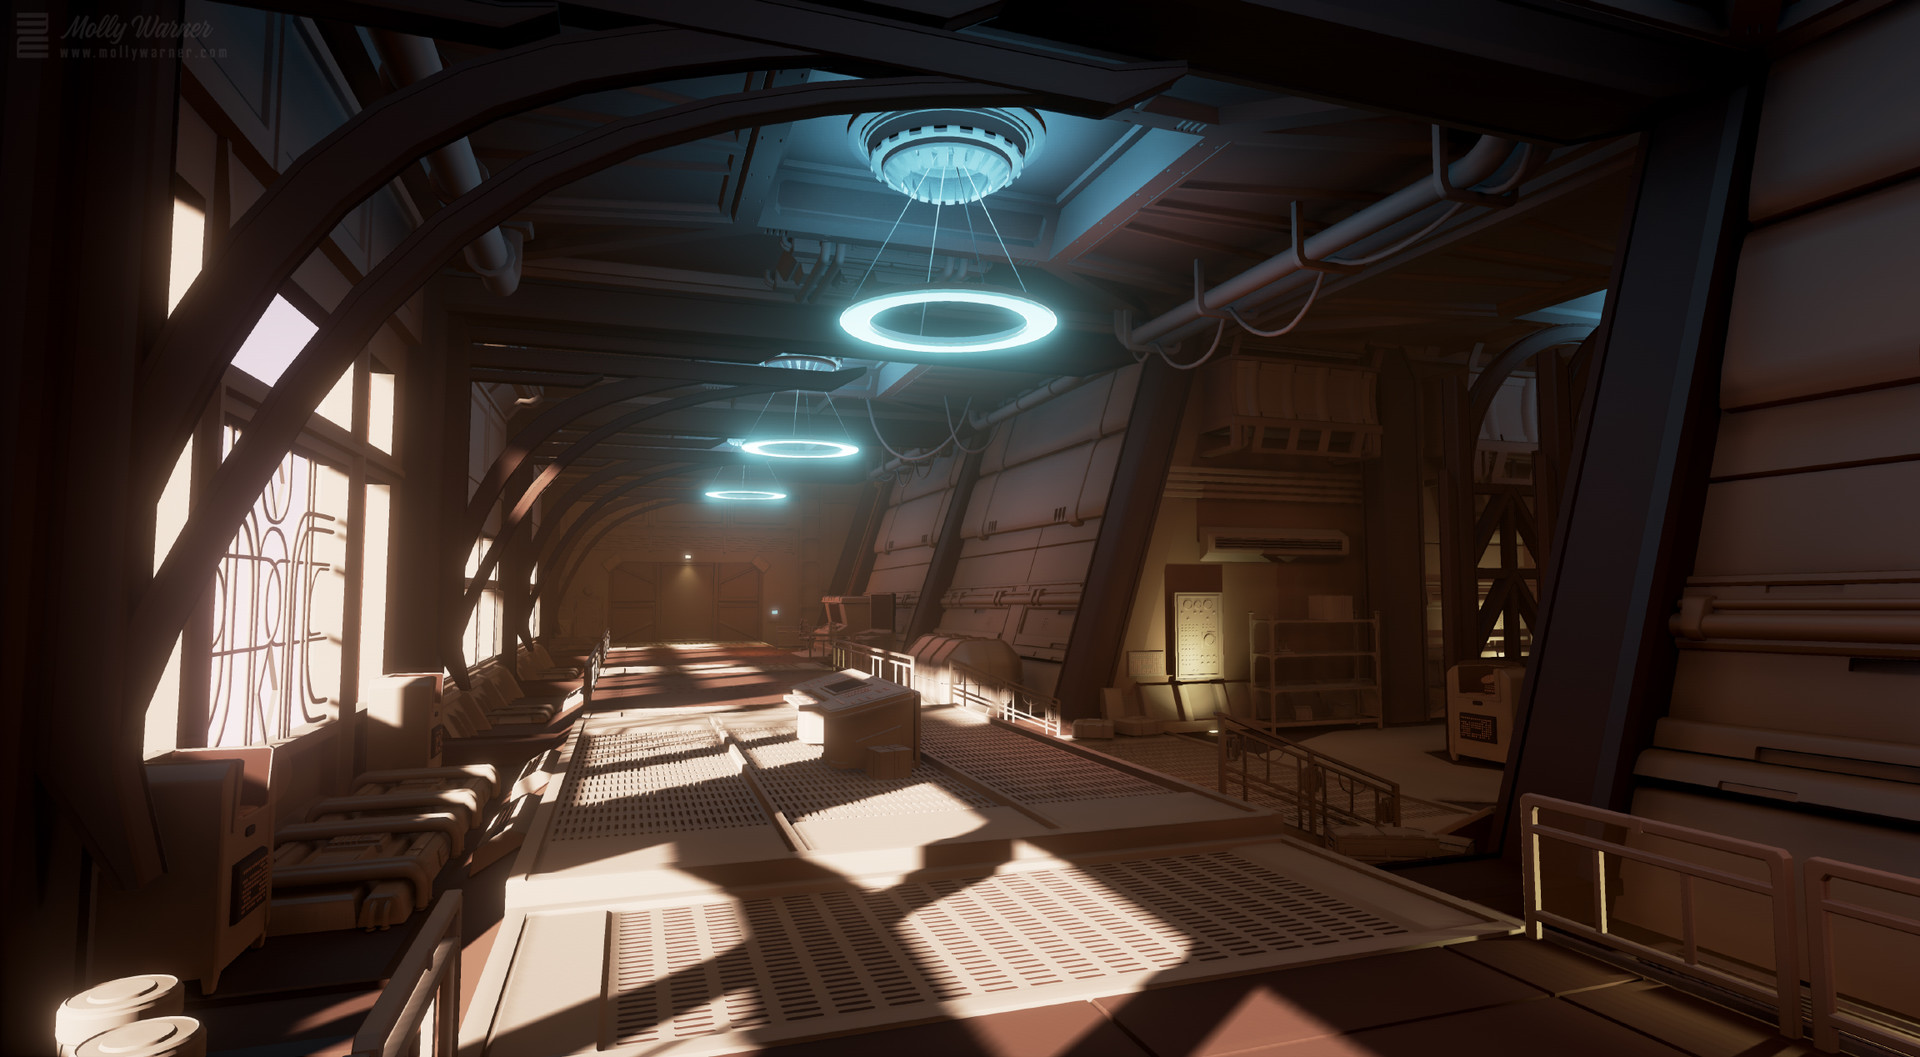 Molly warner art deco sci fi hallway final1